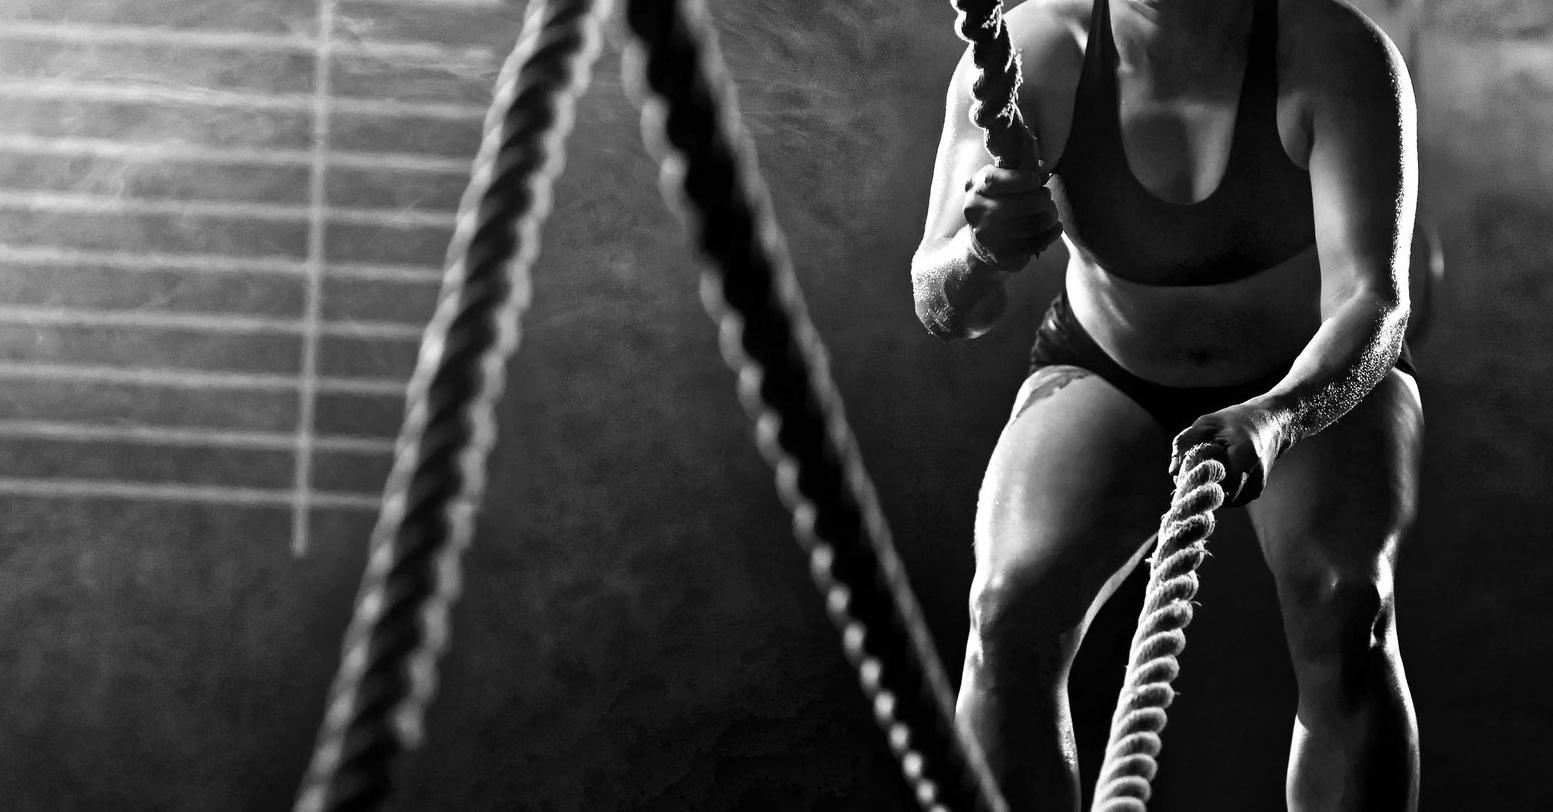 ropes.jpg